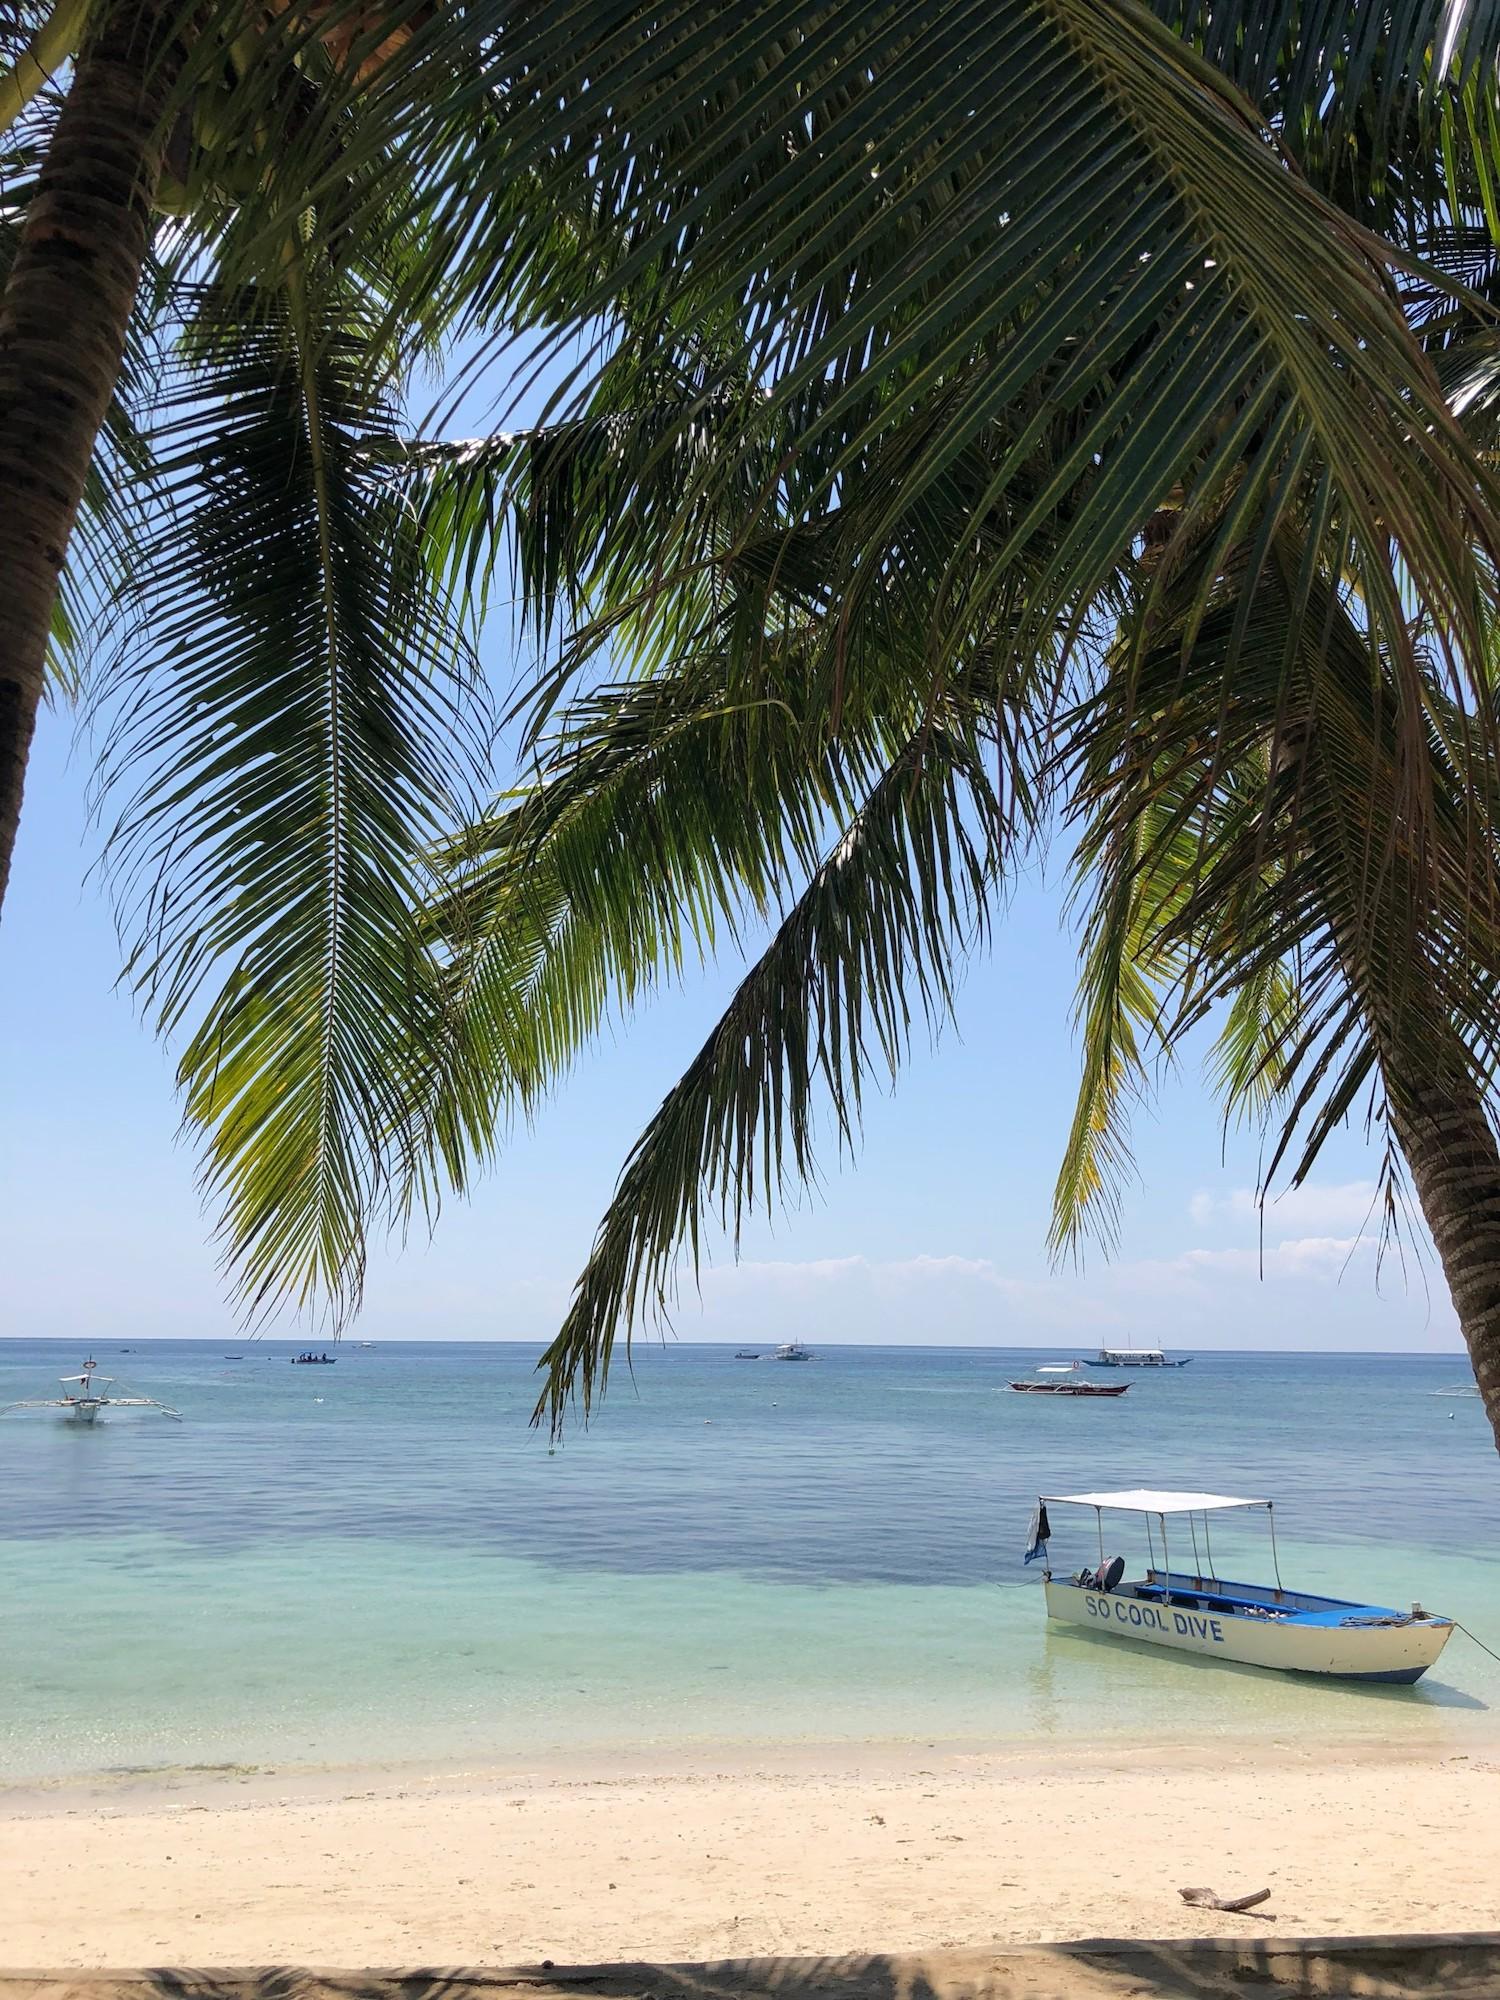 The beautiful Alona Beach on the island of Bohol, Philippines.